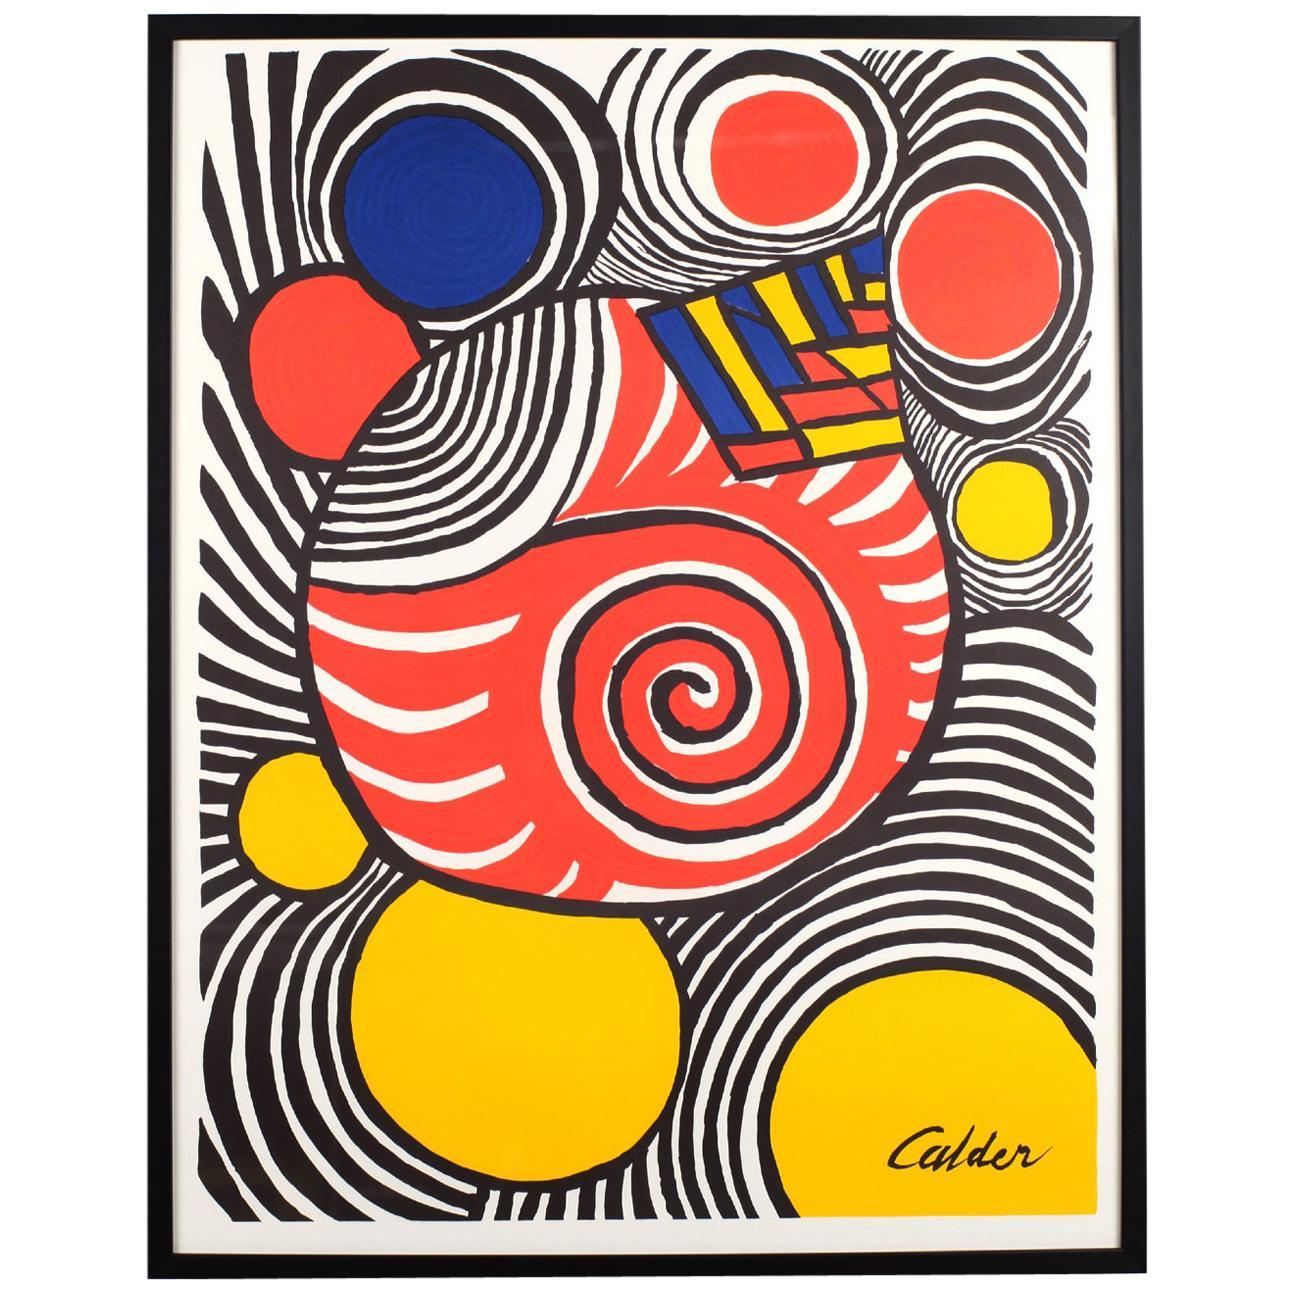 Alexander Calder Color Clown Lithograph